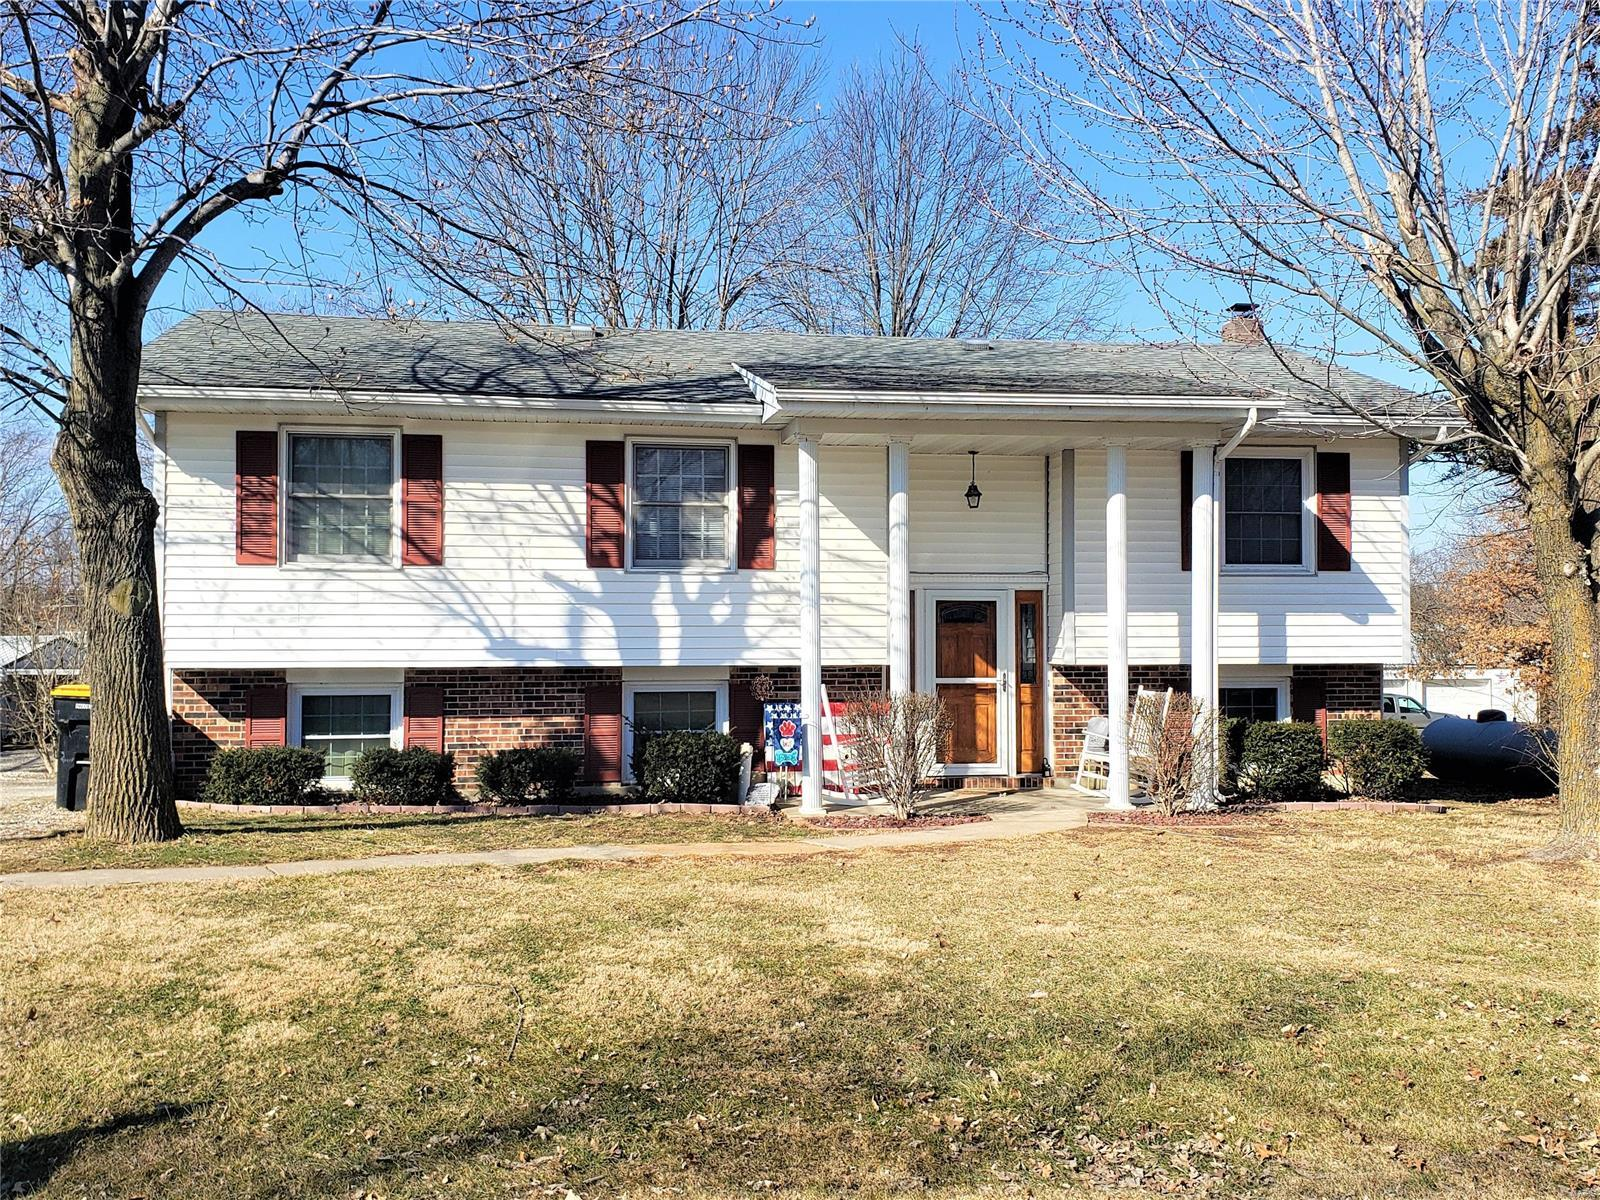 805 Elaine Property Photo - Fulton, MO real estate listing